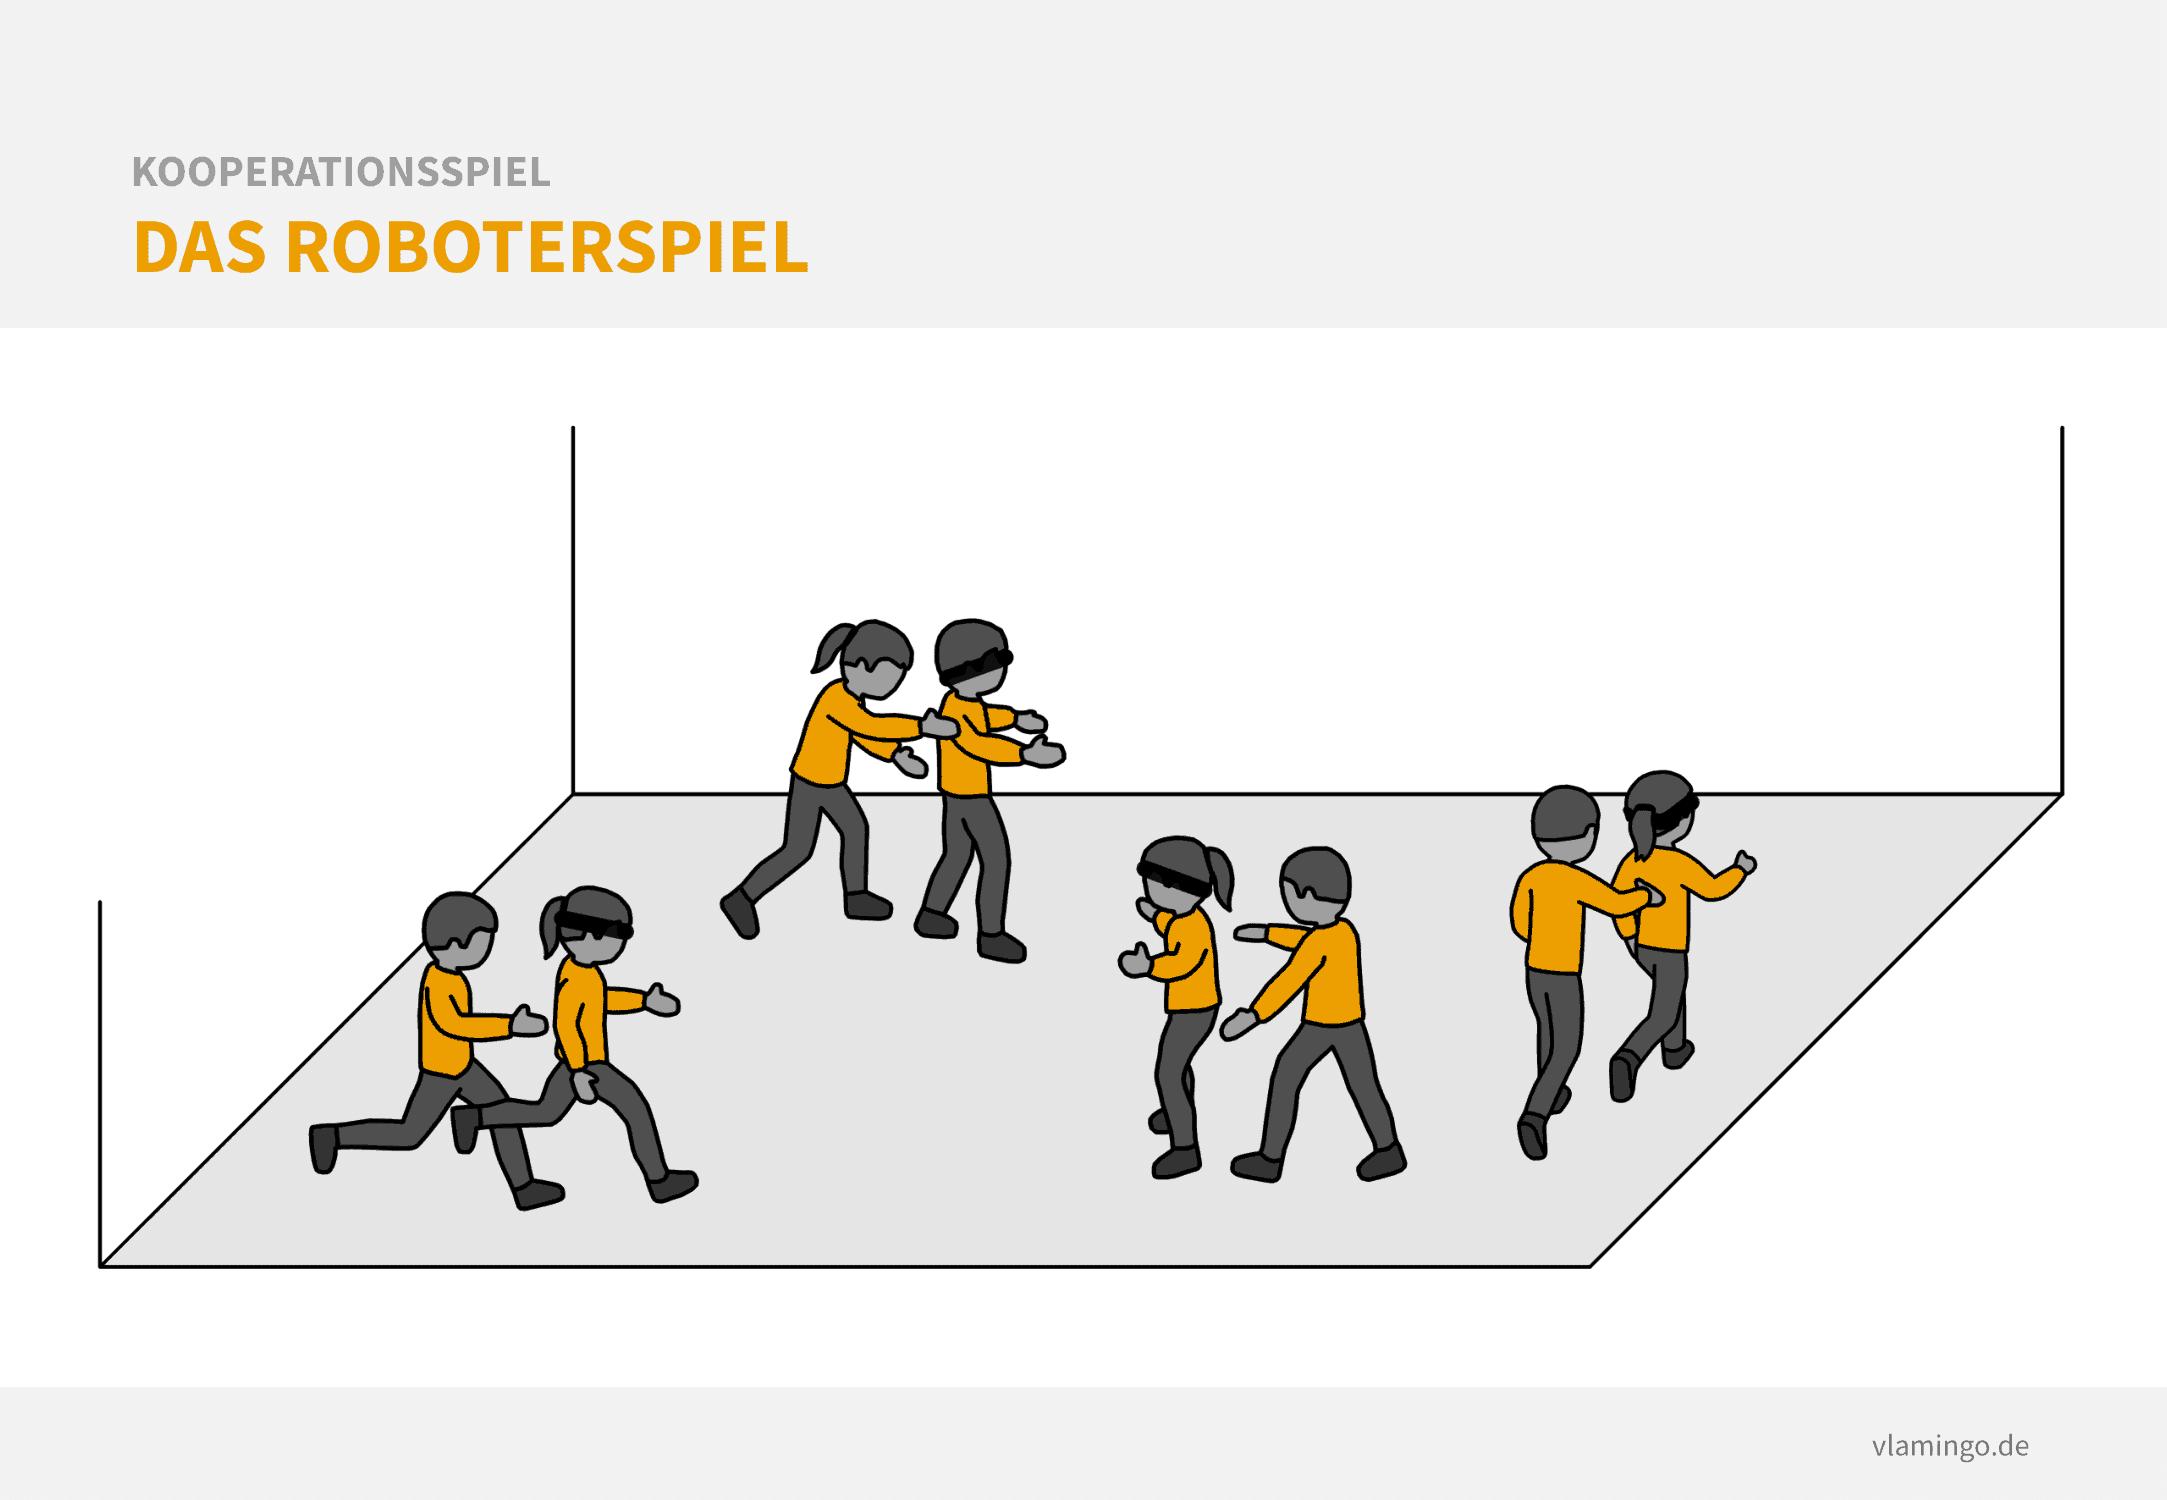 Kooperationsspiel: Das Roboterspiel